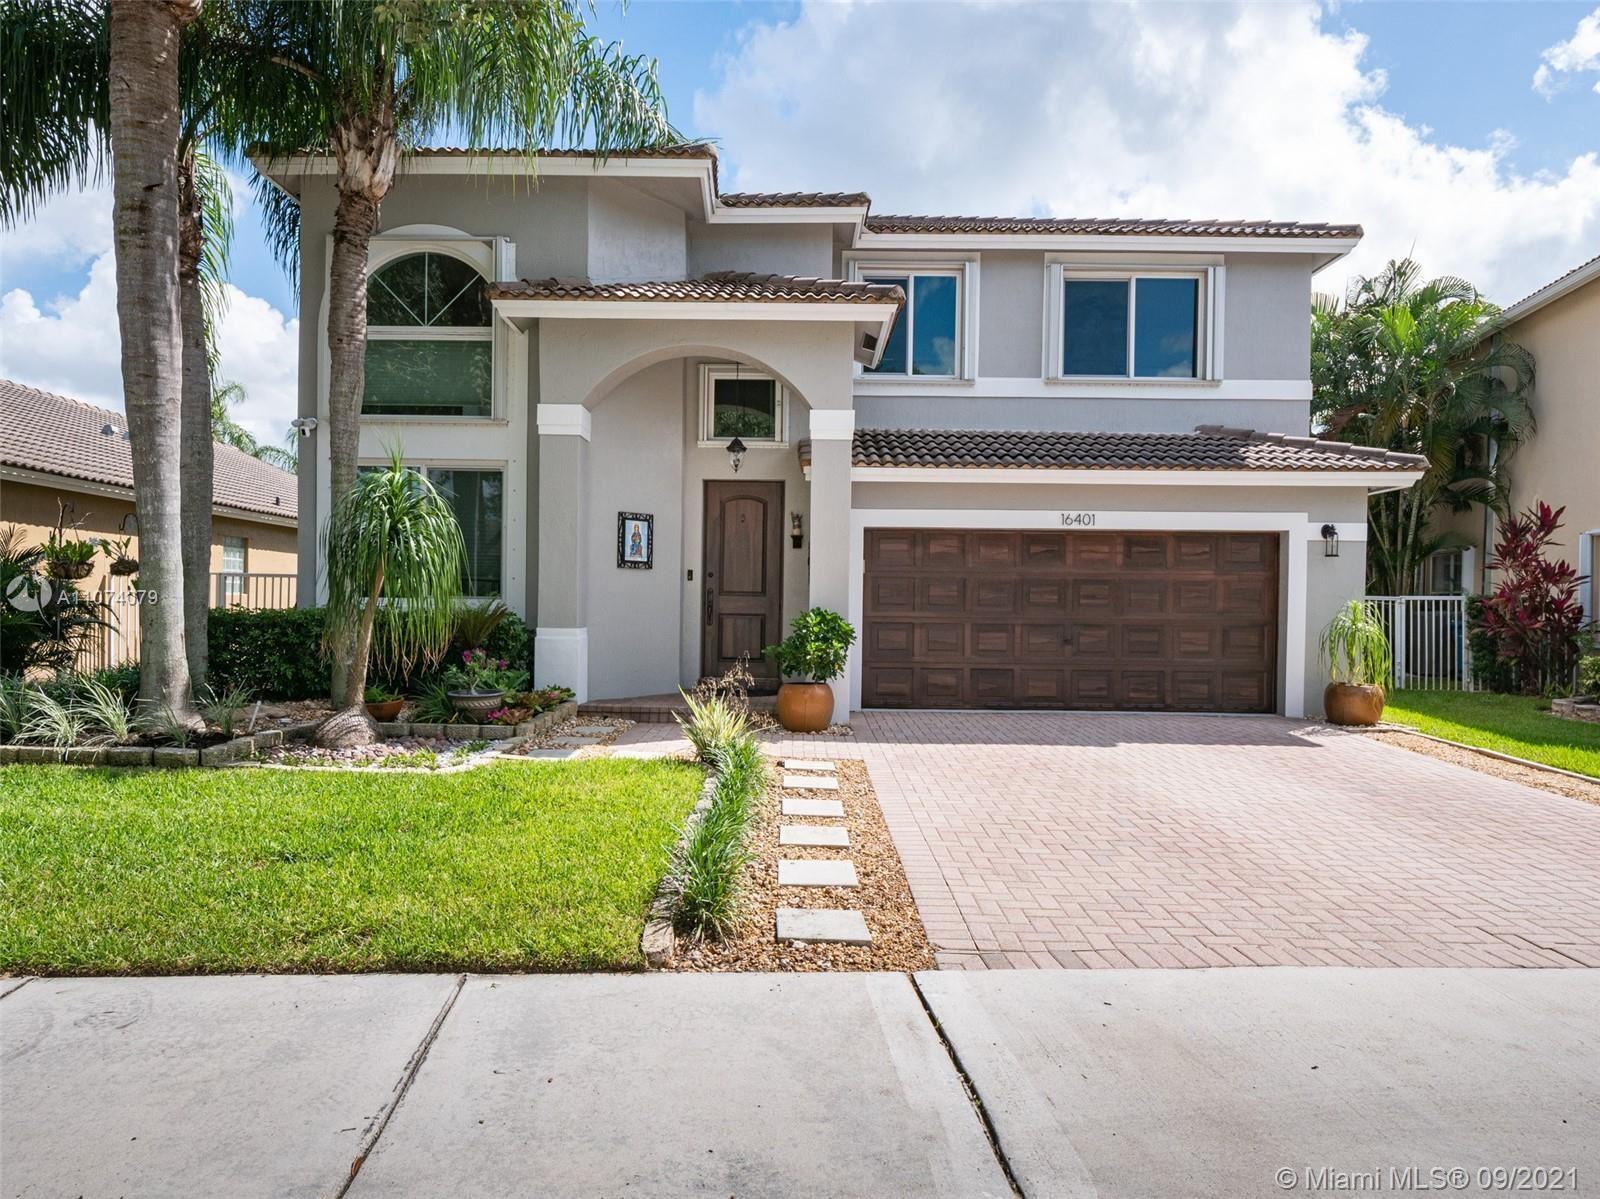 Photo of 16401 Turquoise Trl, Weston, FL 33331 (MLS # A11074079)